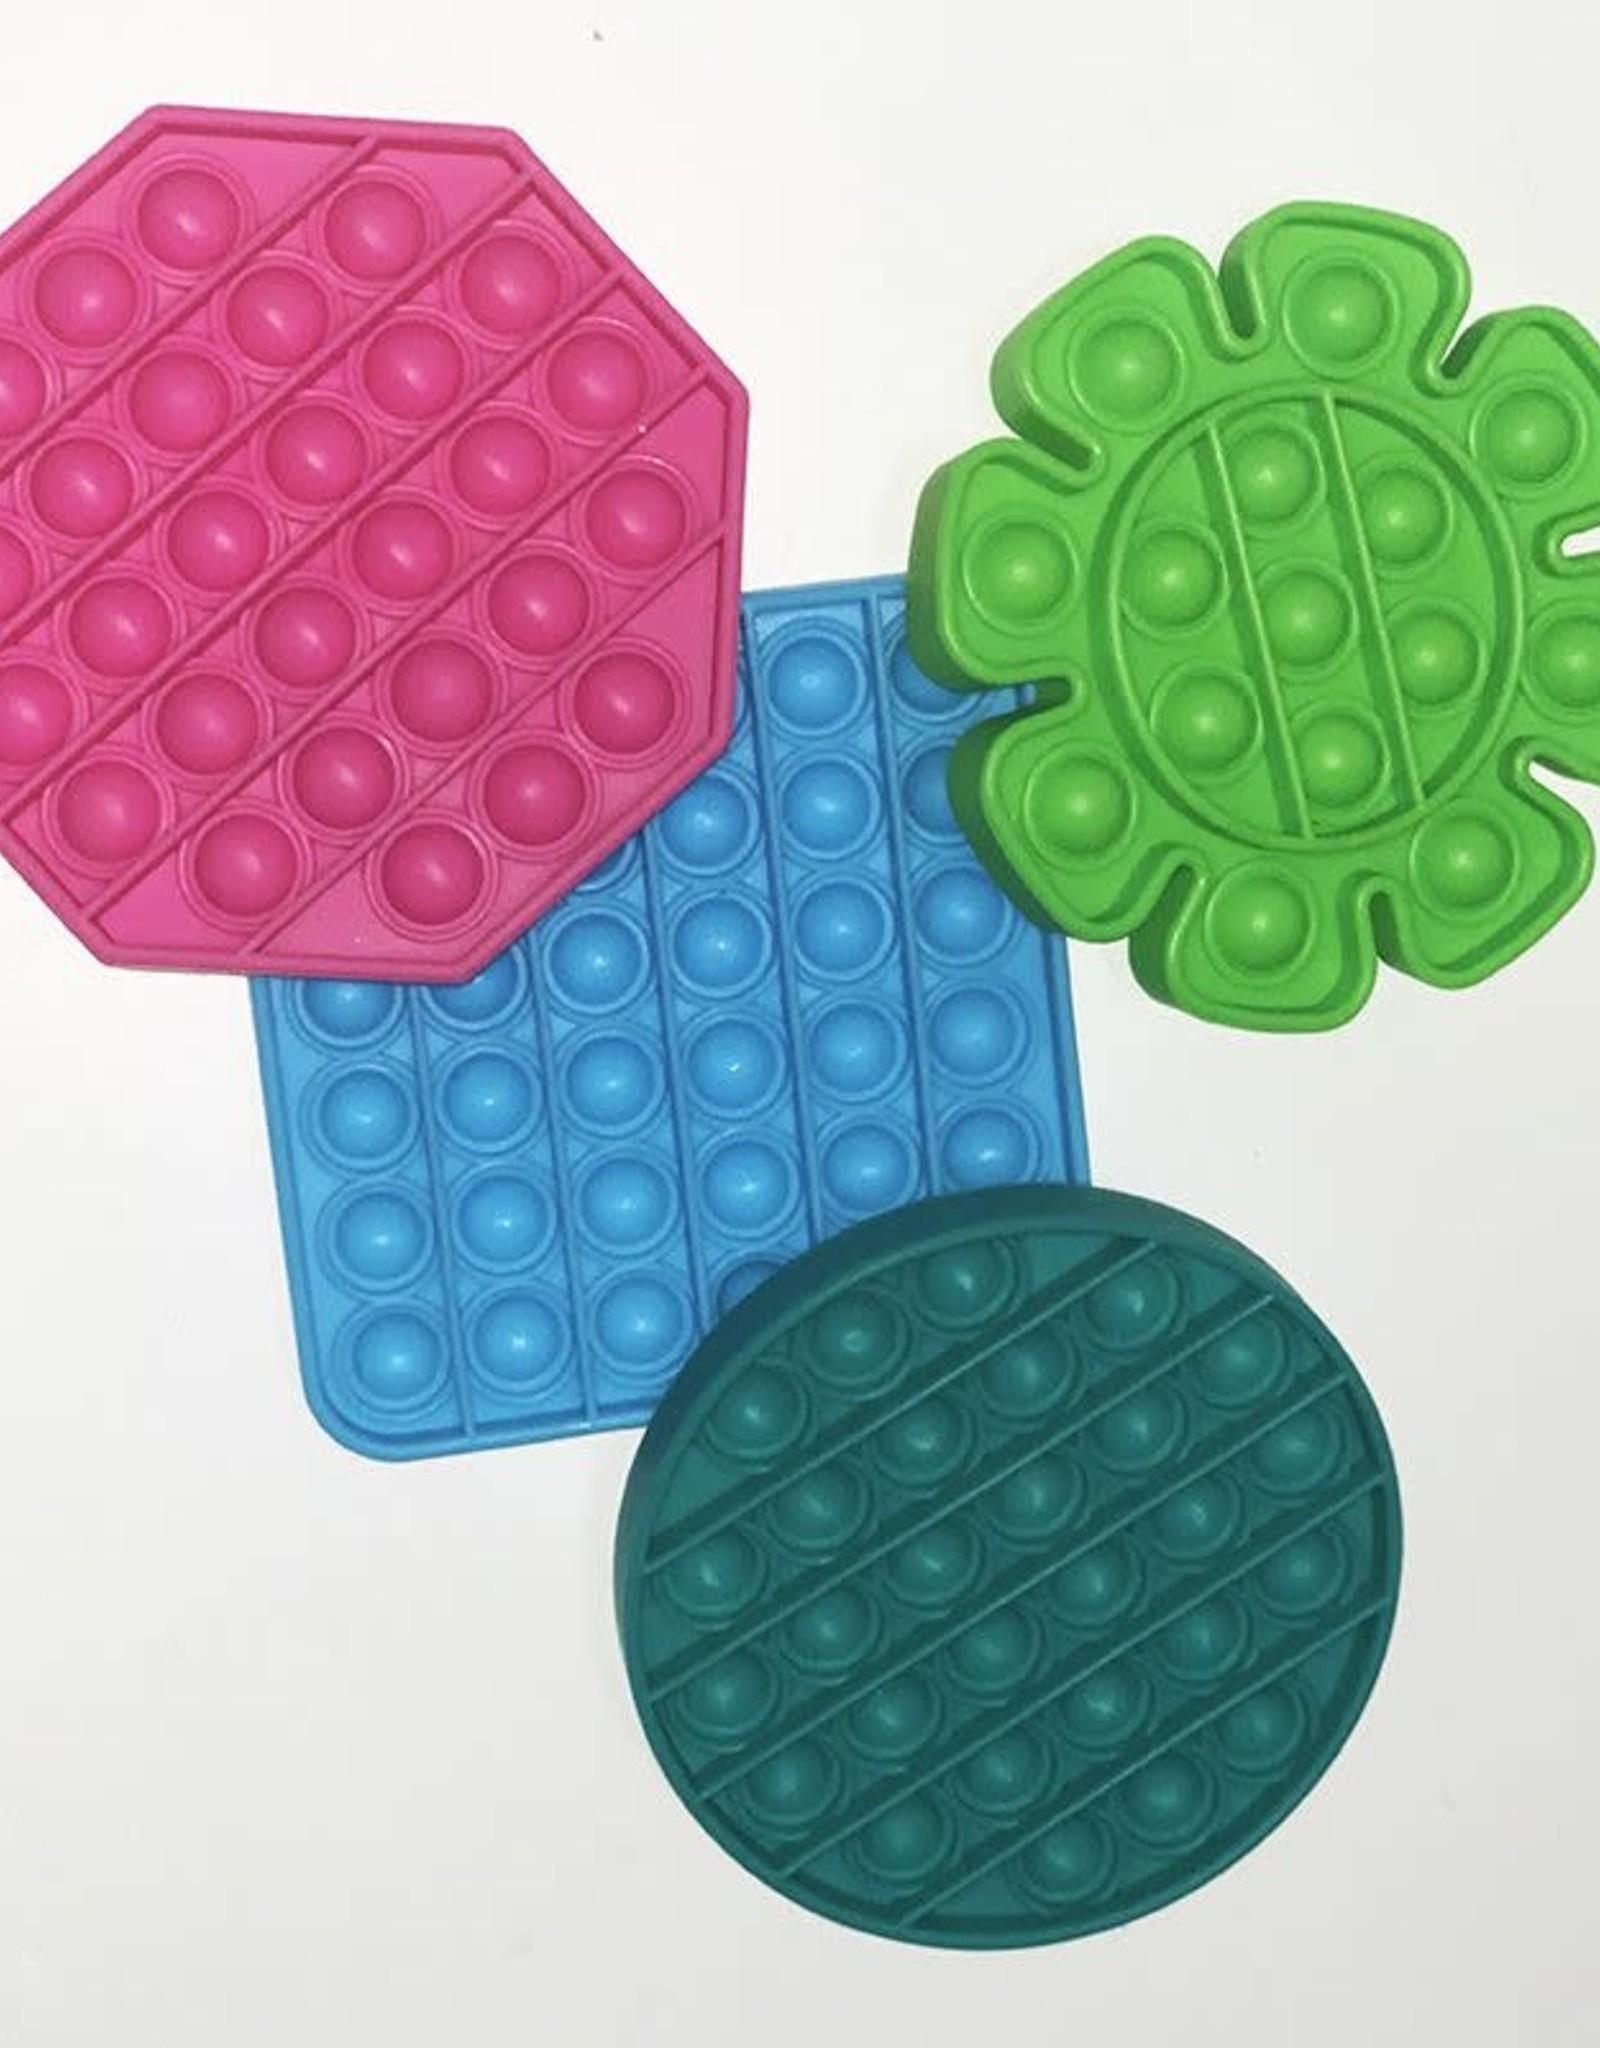 Komarc Games Pressit! Popper Fidget Toy, Blue Square